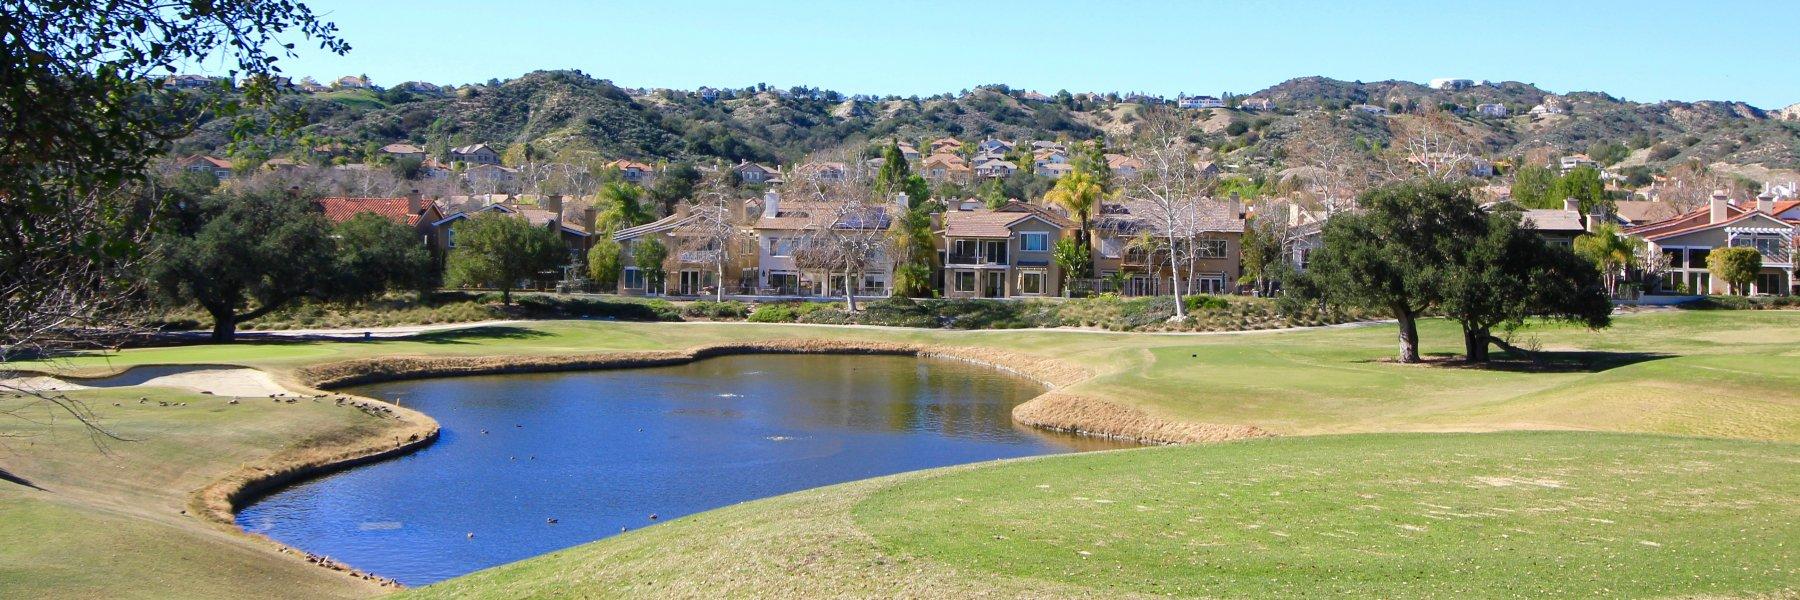 Rancho Colinas is a community of homes in Coto de Caza, California